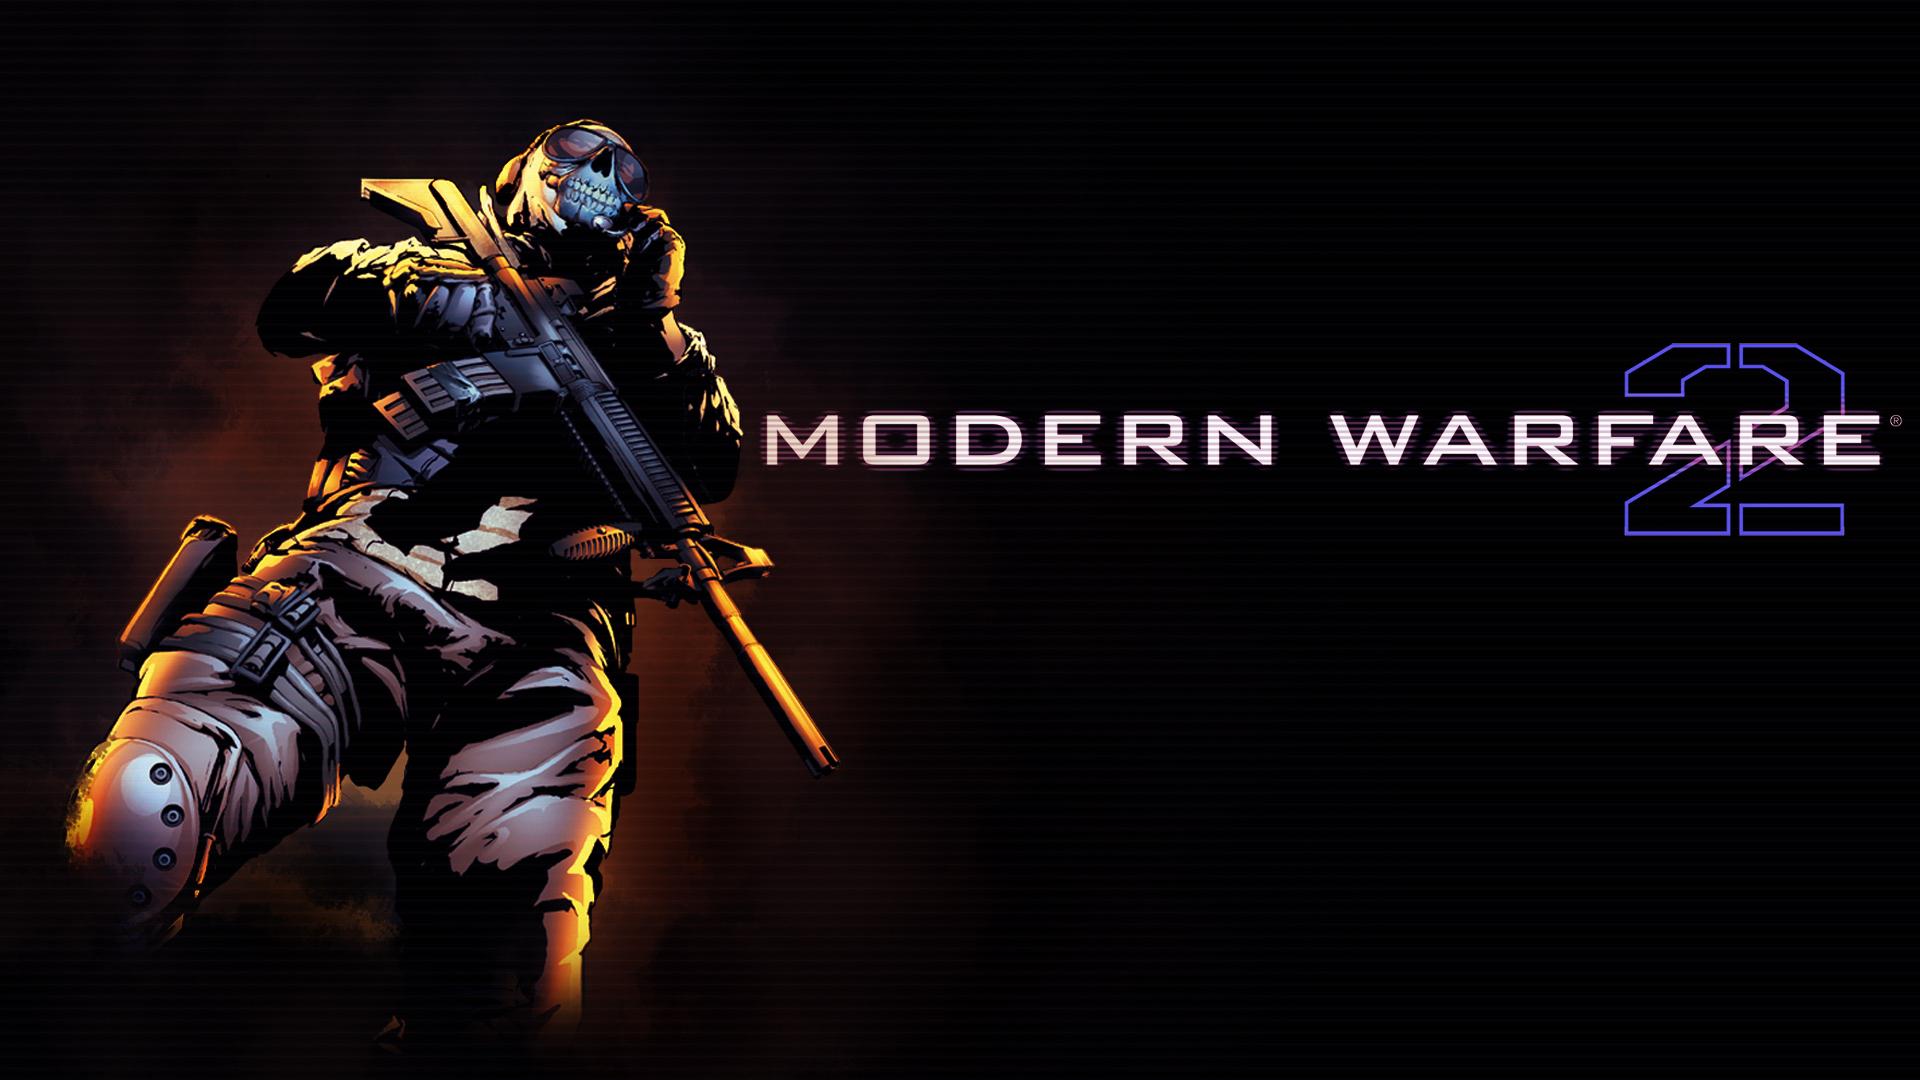 Tgdb Browse Game Call Of Duty Modern Warfare 2